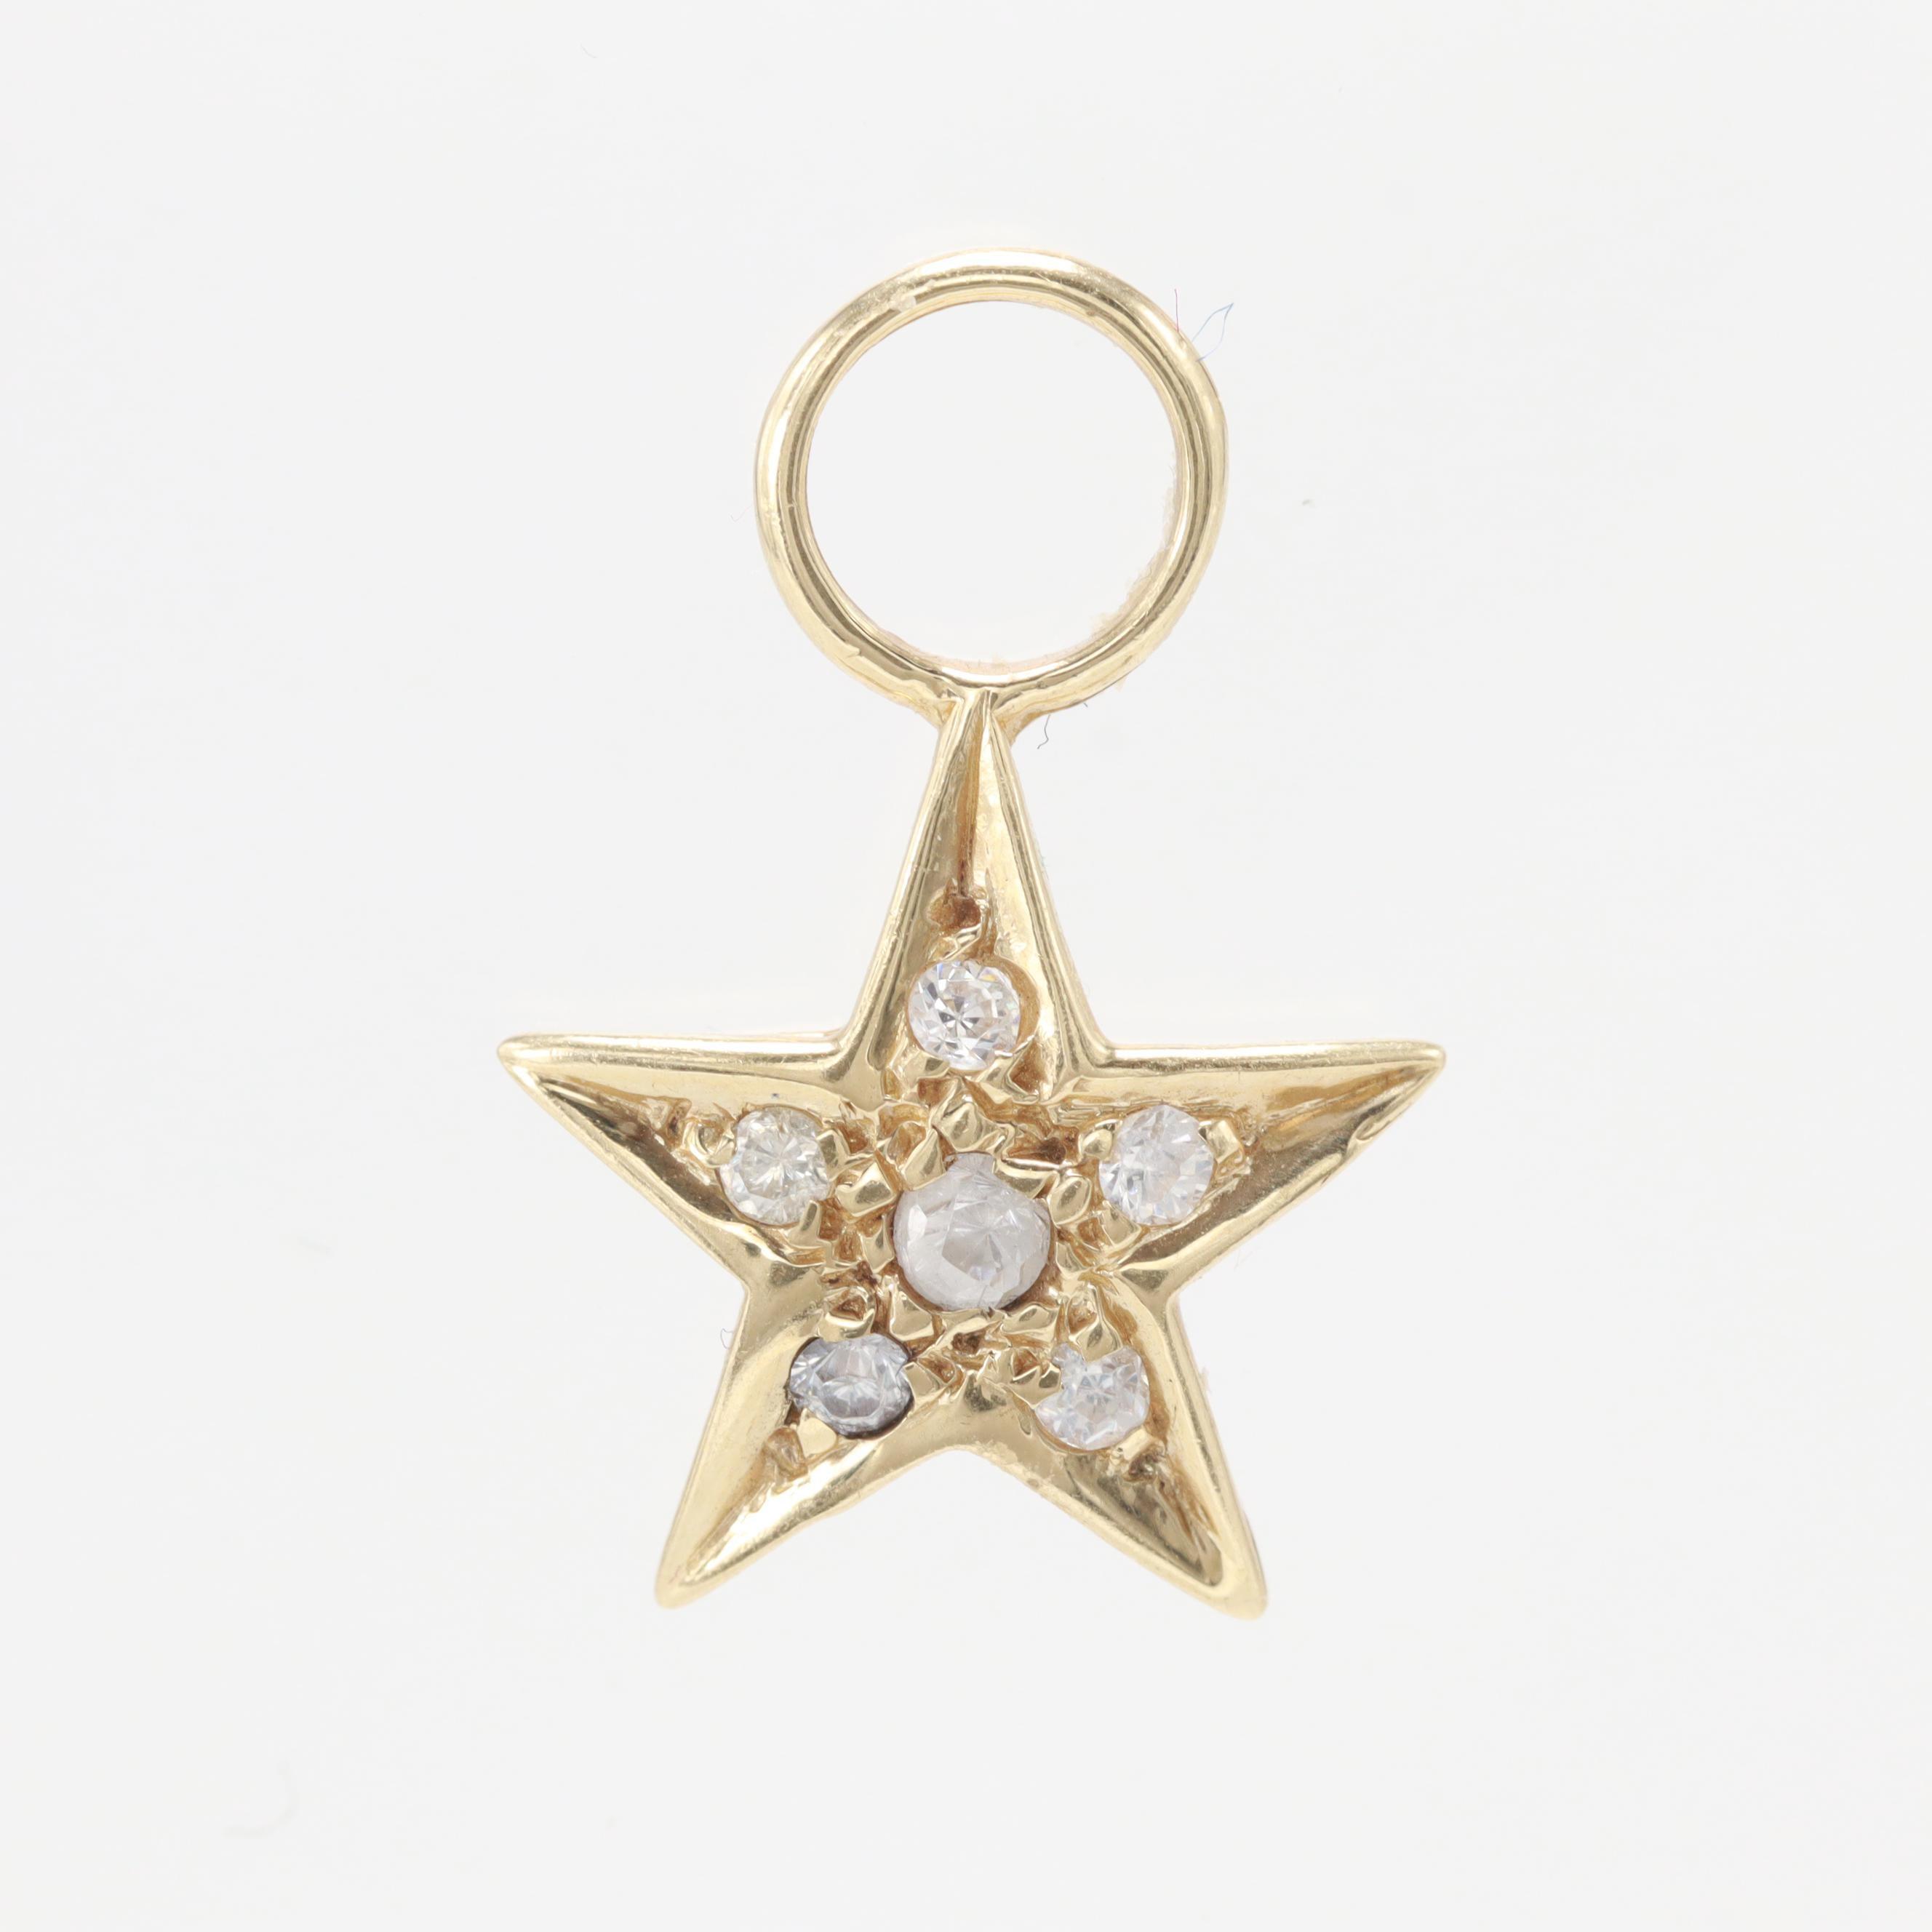 14K Yellow Gold Cubic Zirconia Star Pendant